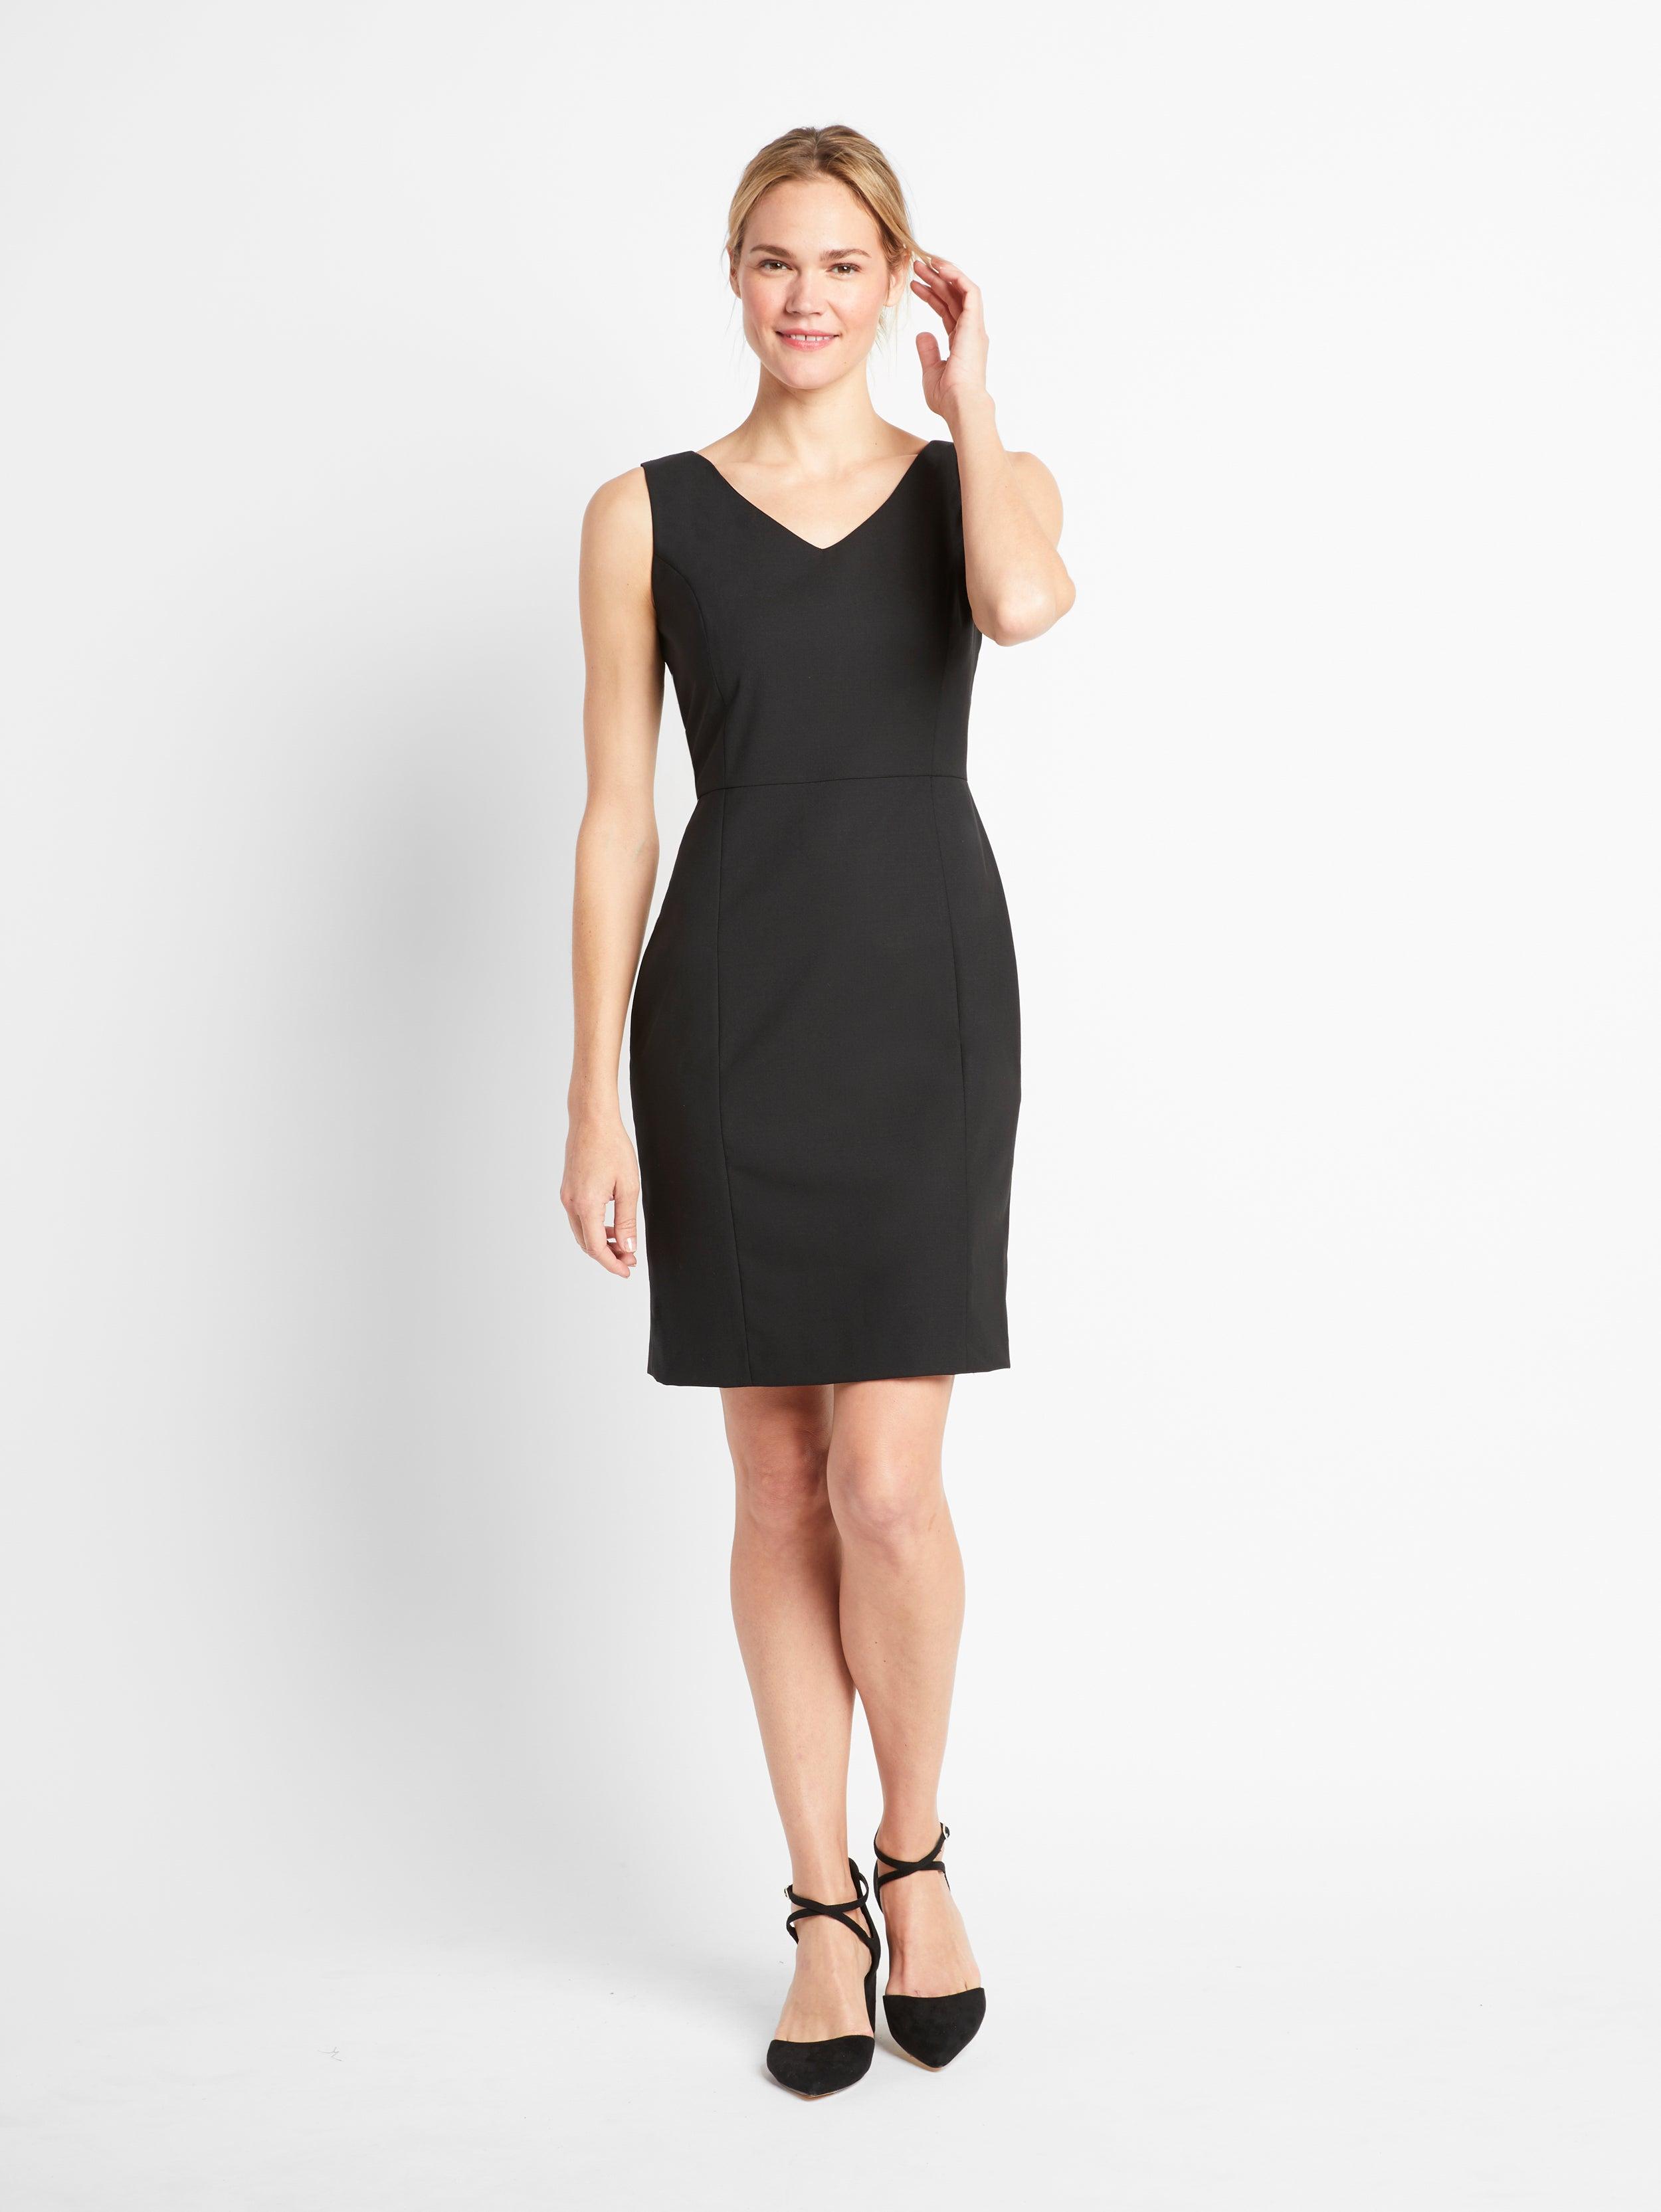 Totally Workwear, Work Clothes, Work Boots & Hi Vis Online